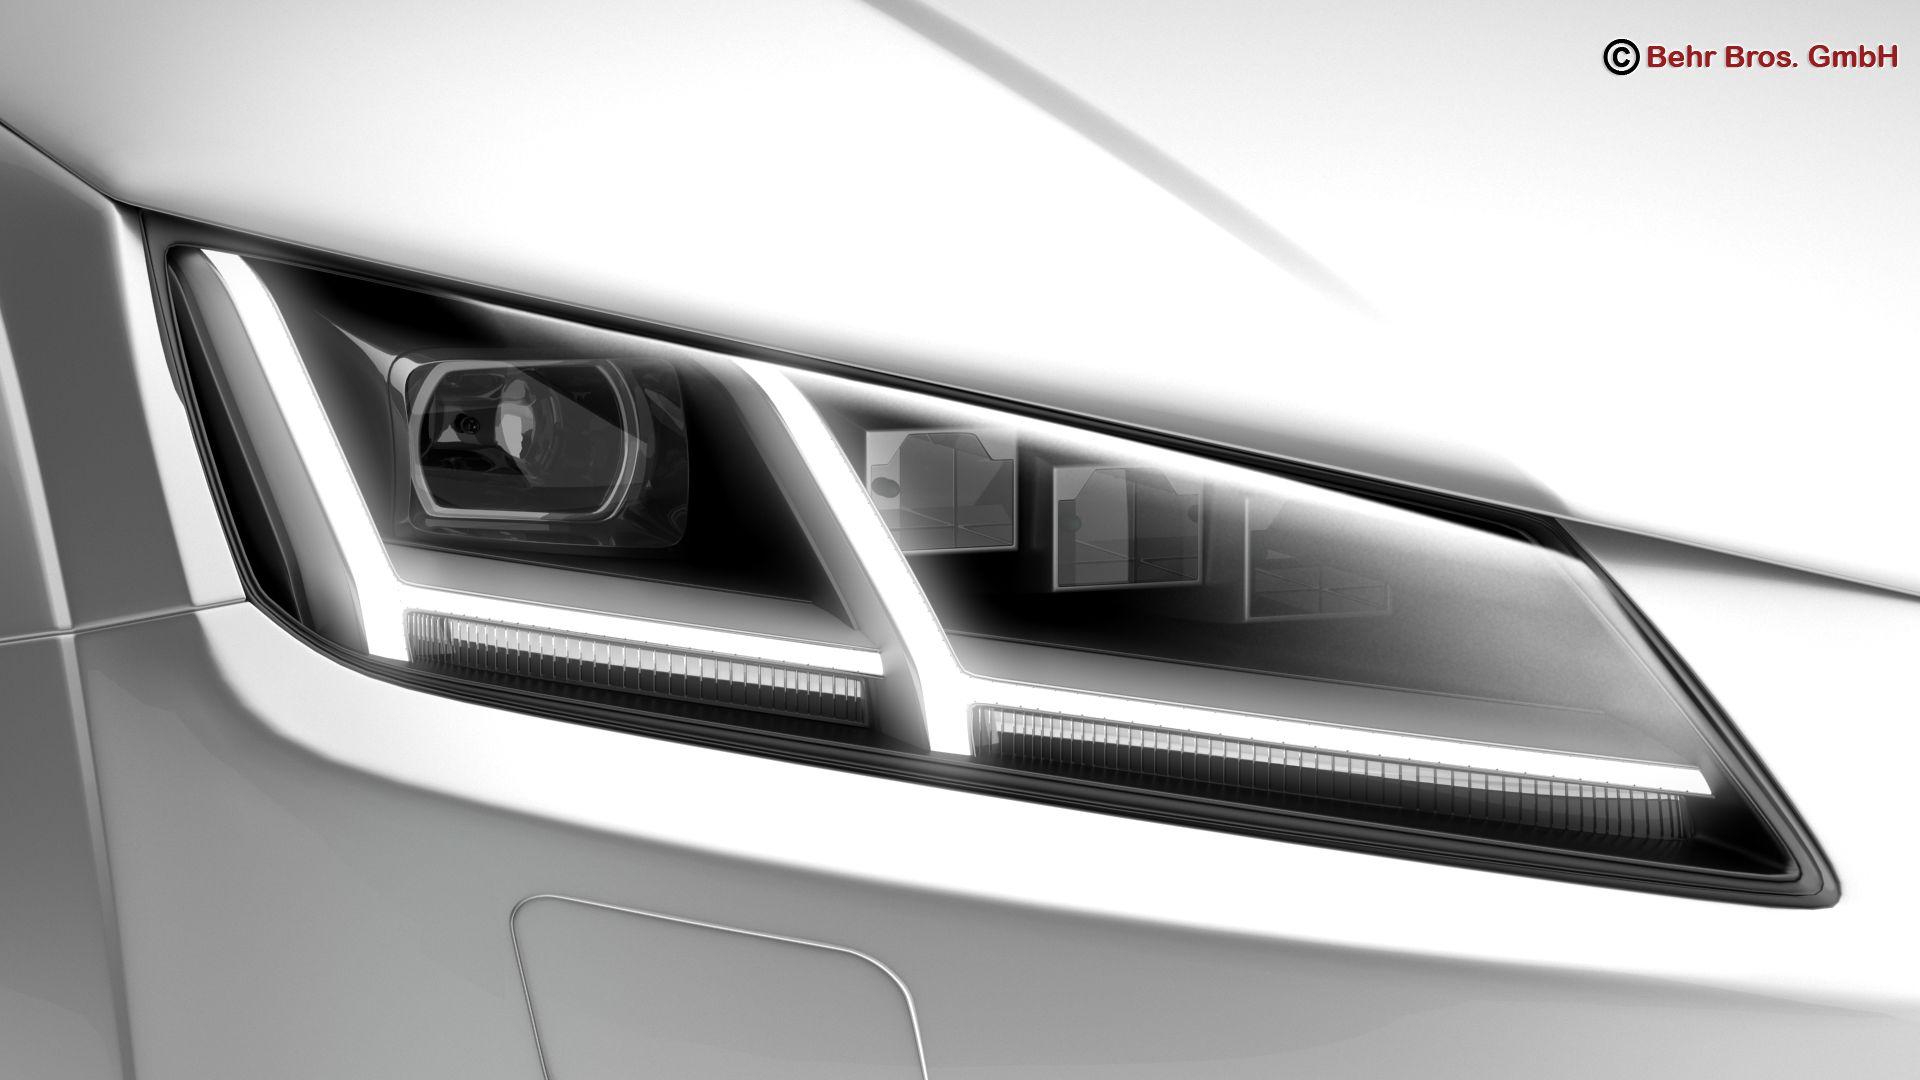 audi tt coupe 2015 3d model 3ds max fbx c4d lwo ma mb obj 203330